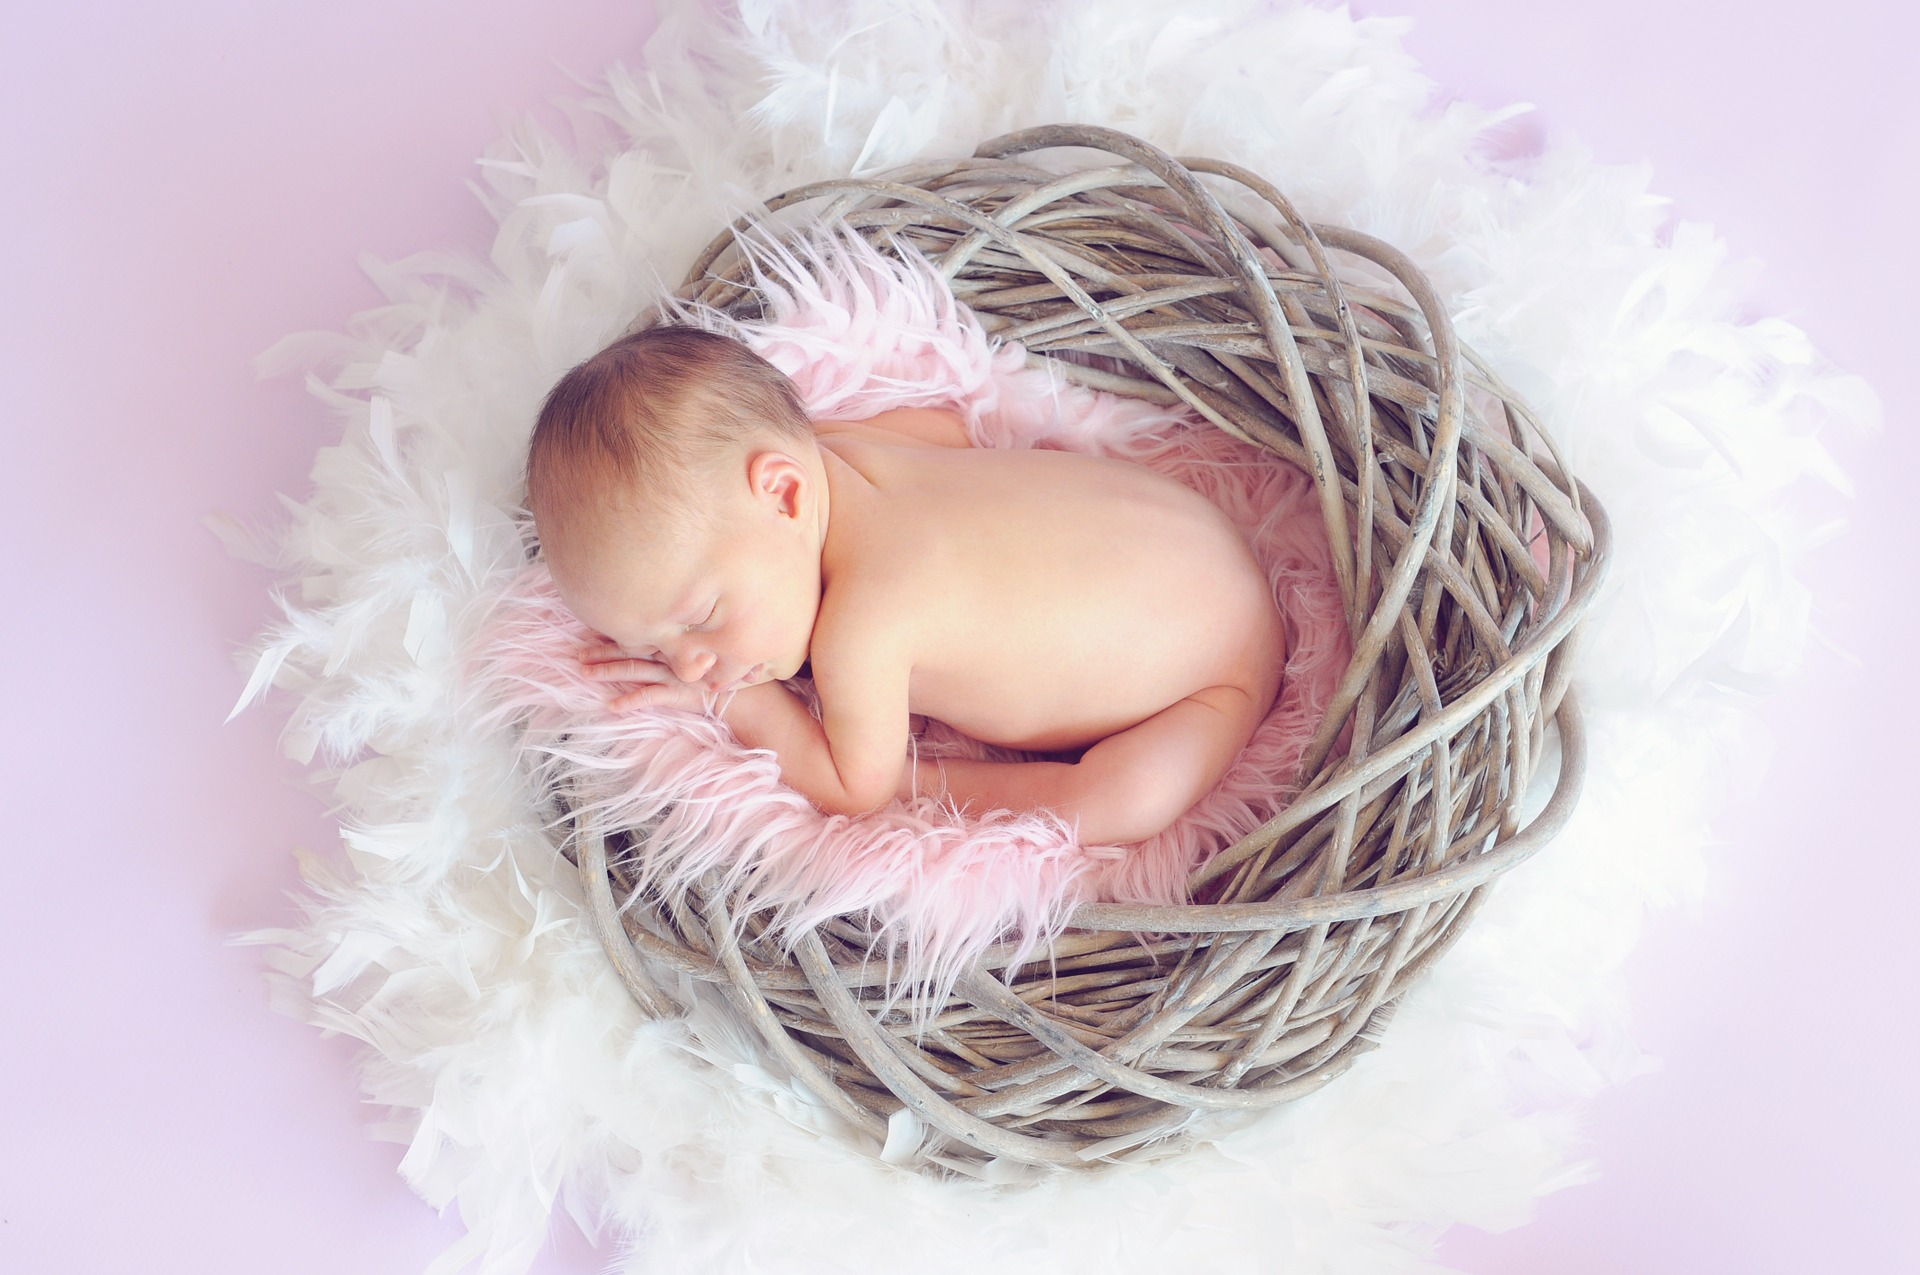 Жизнь ребенка в утробе матери